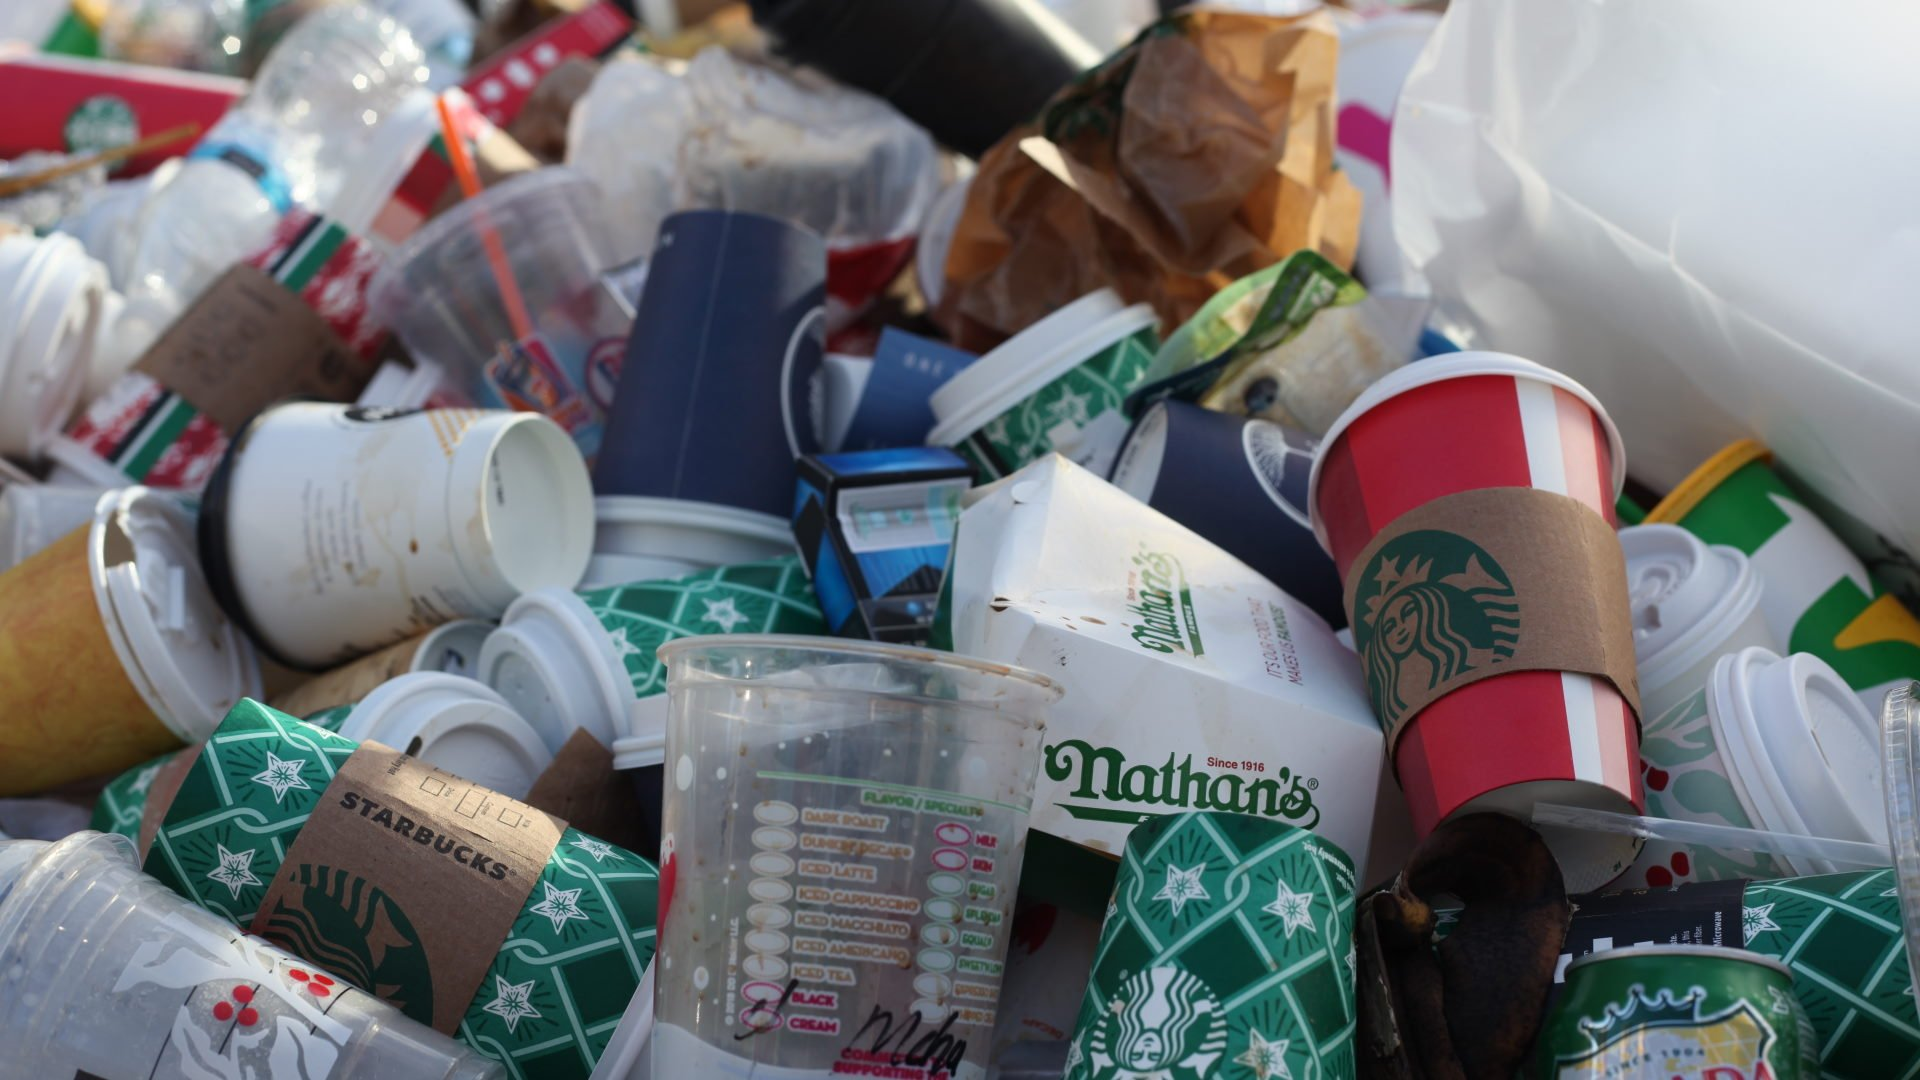 Affald, kaffekopper, stock, unsplash